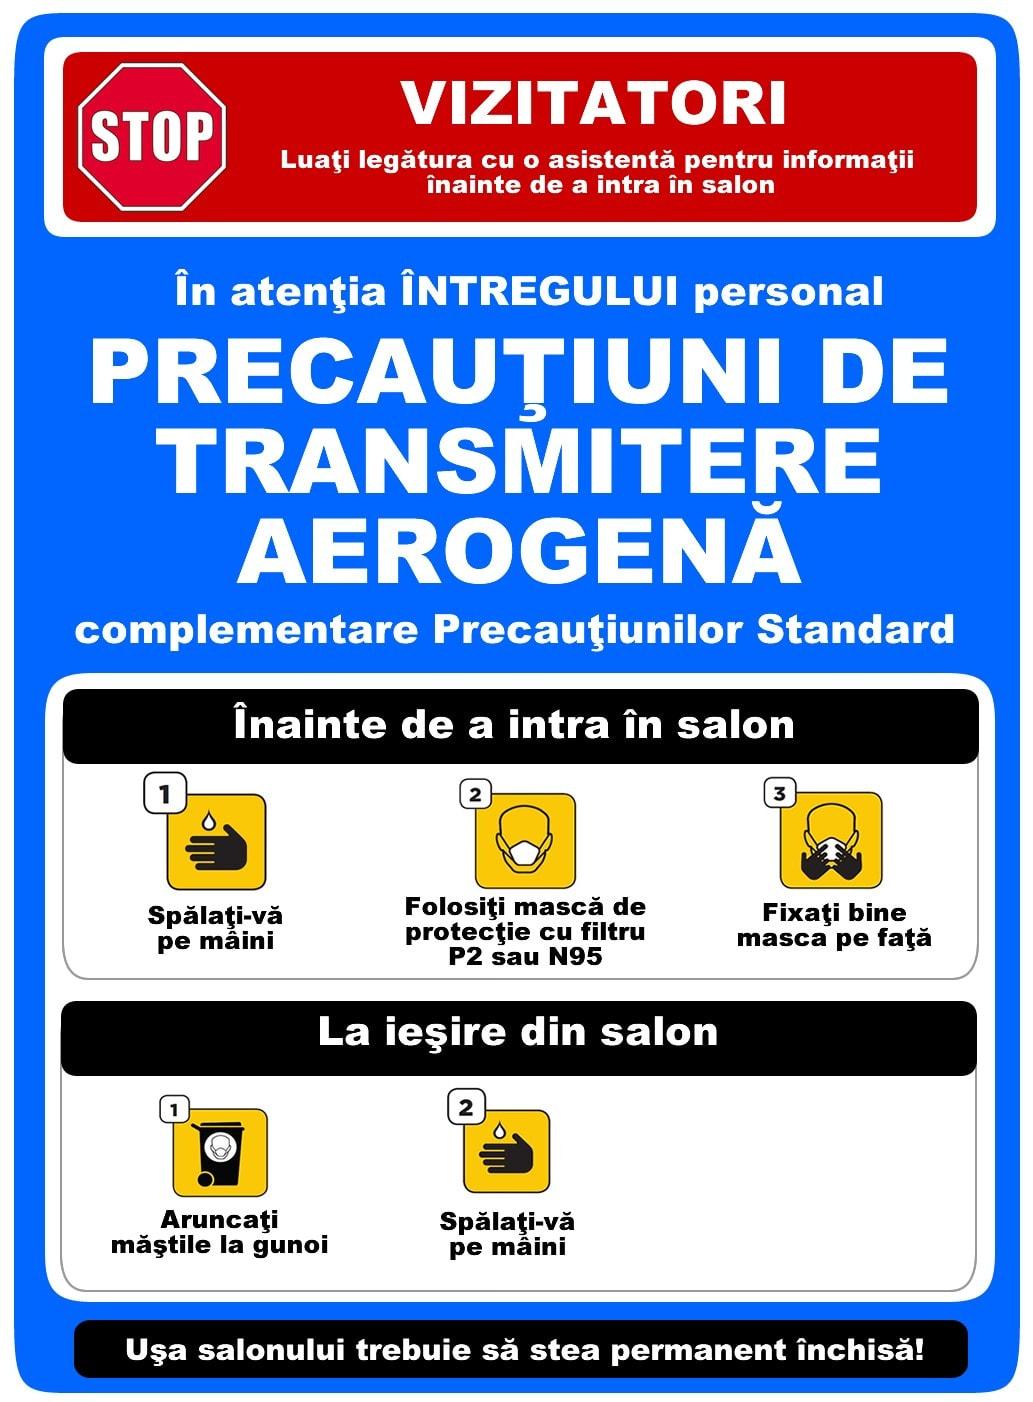 Precautiuni aerogene